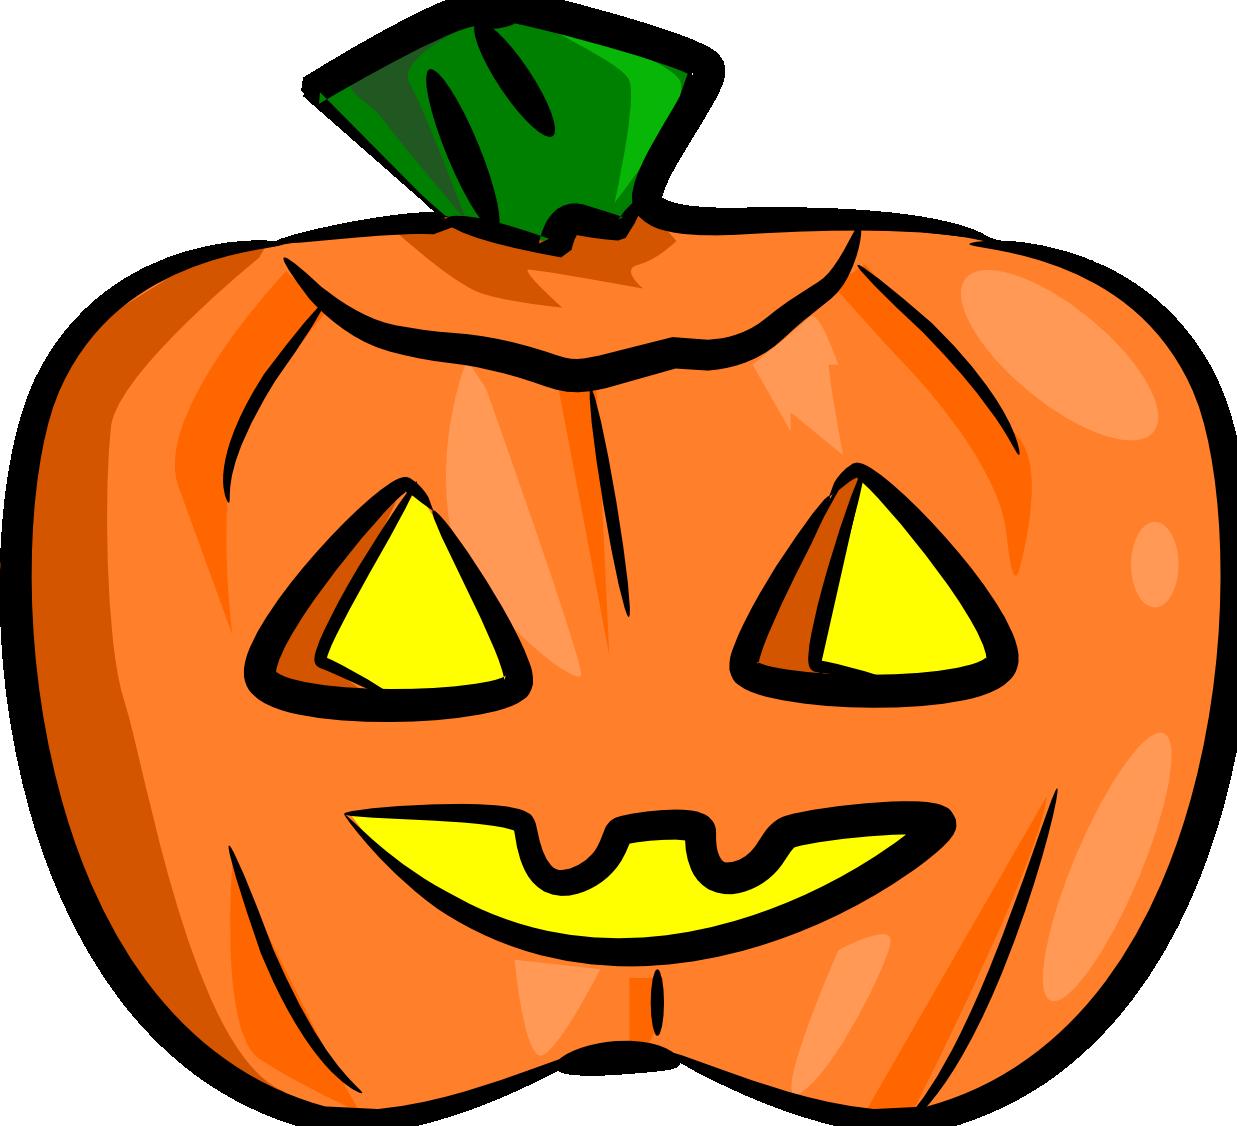 Jack-o'-lantern clipart #8, Download drawings